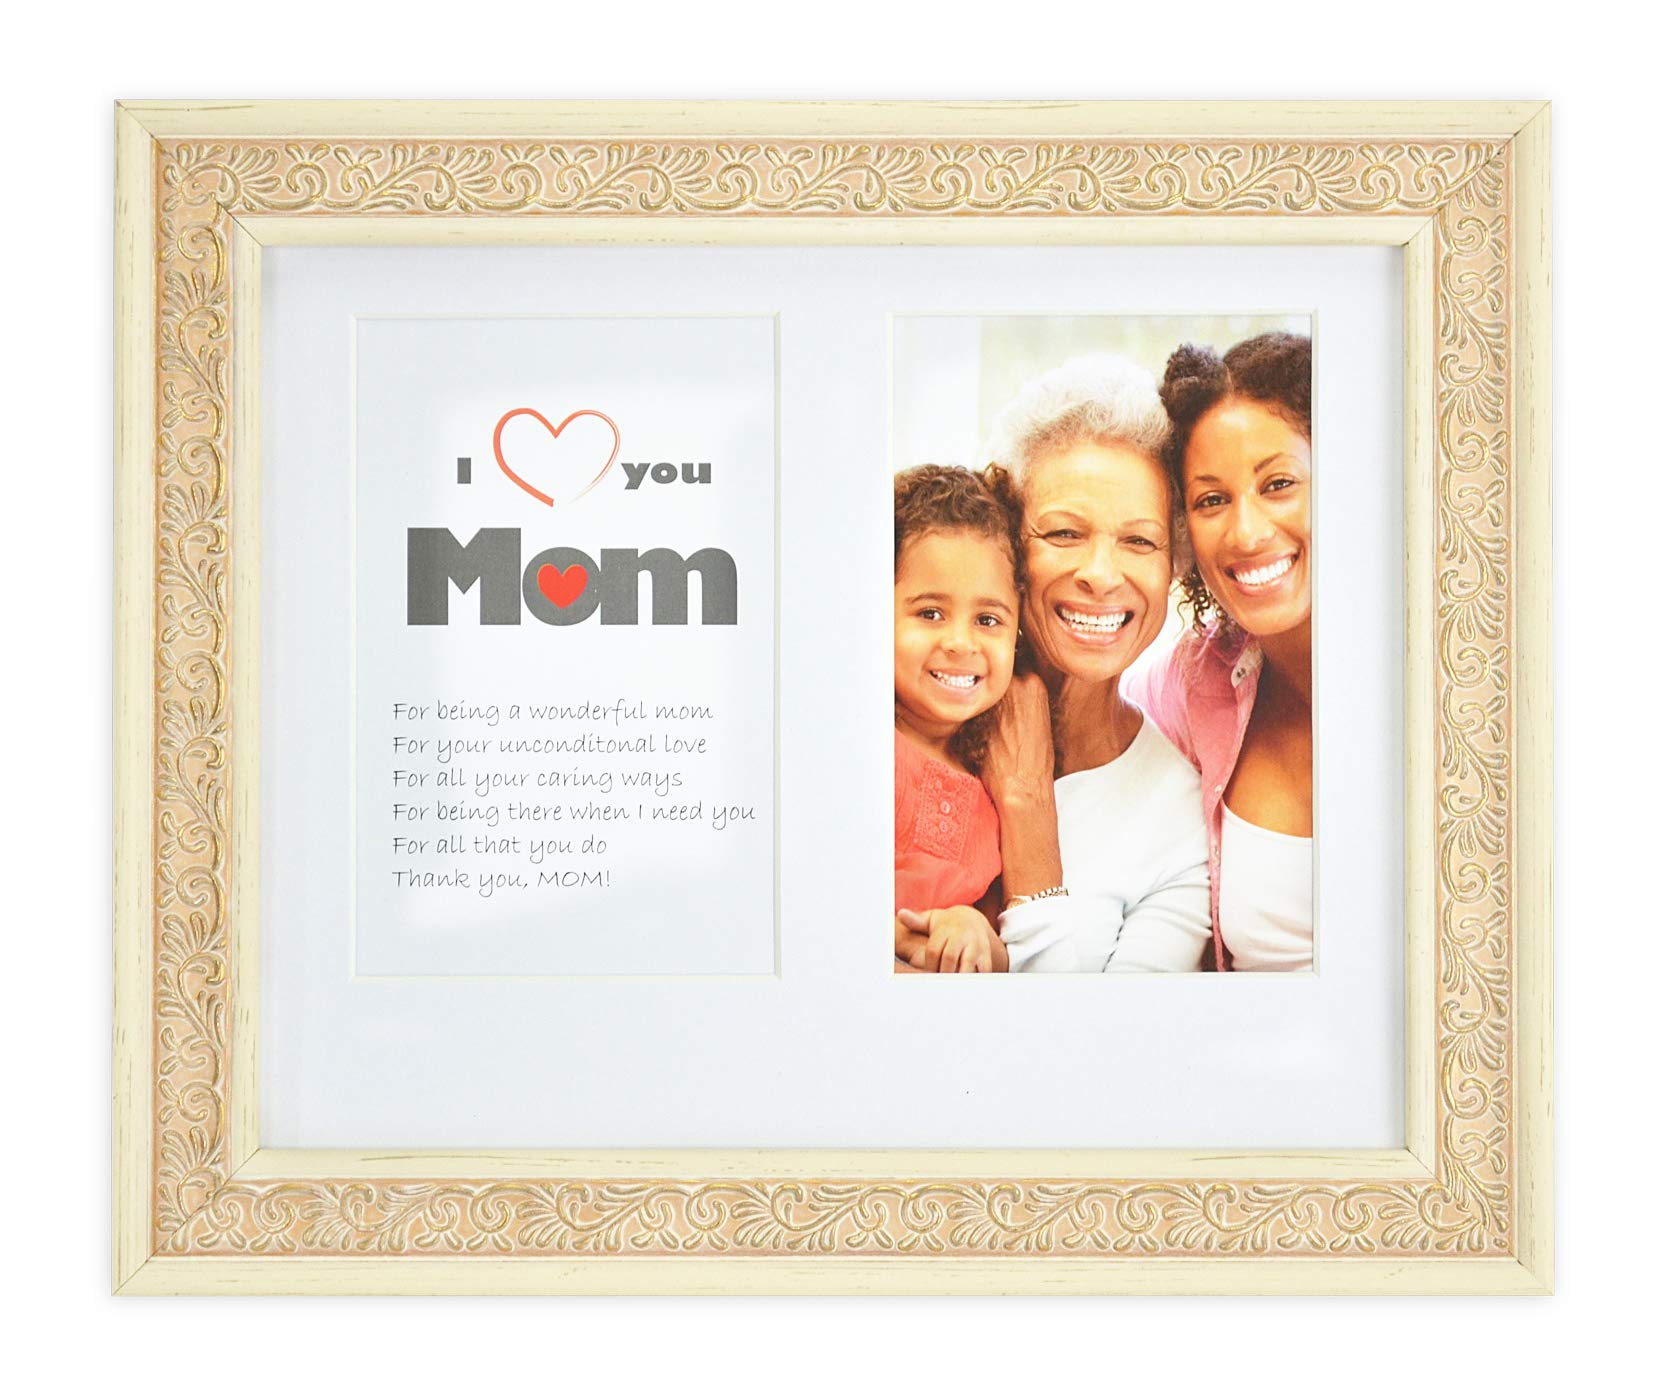 Golden State Art 8x10 Frame Two 4x6 Photo - White